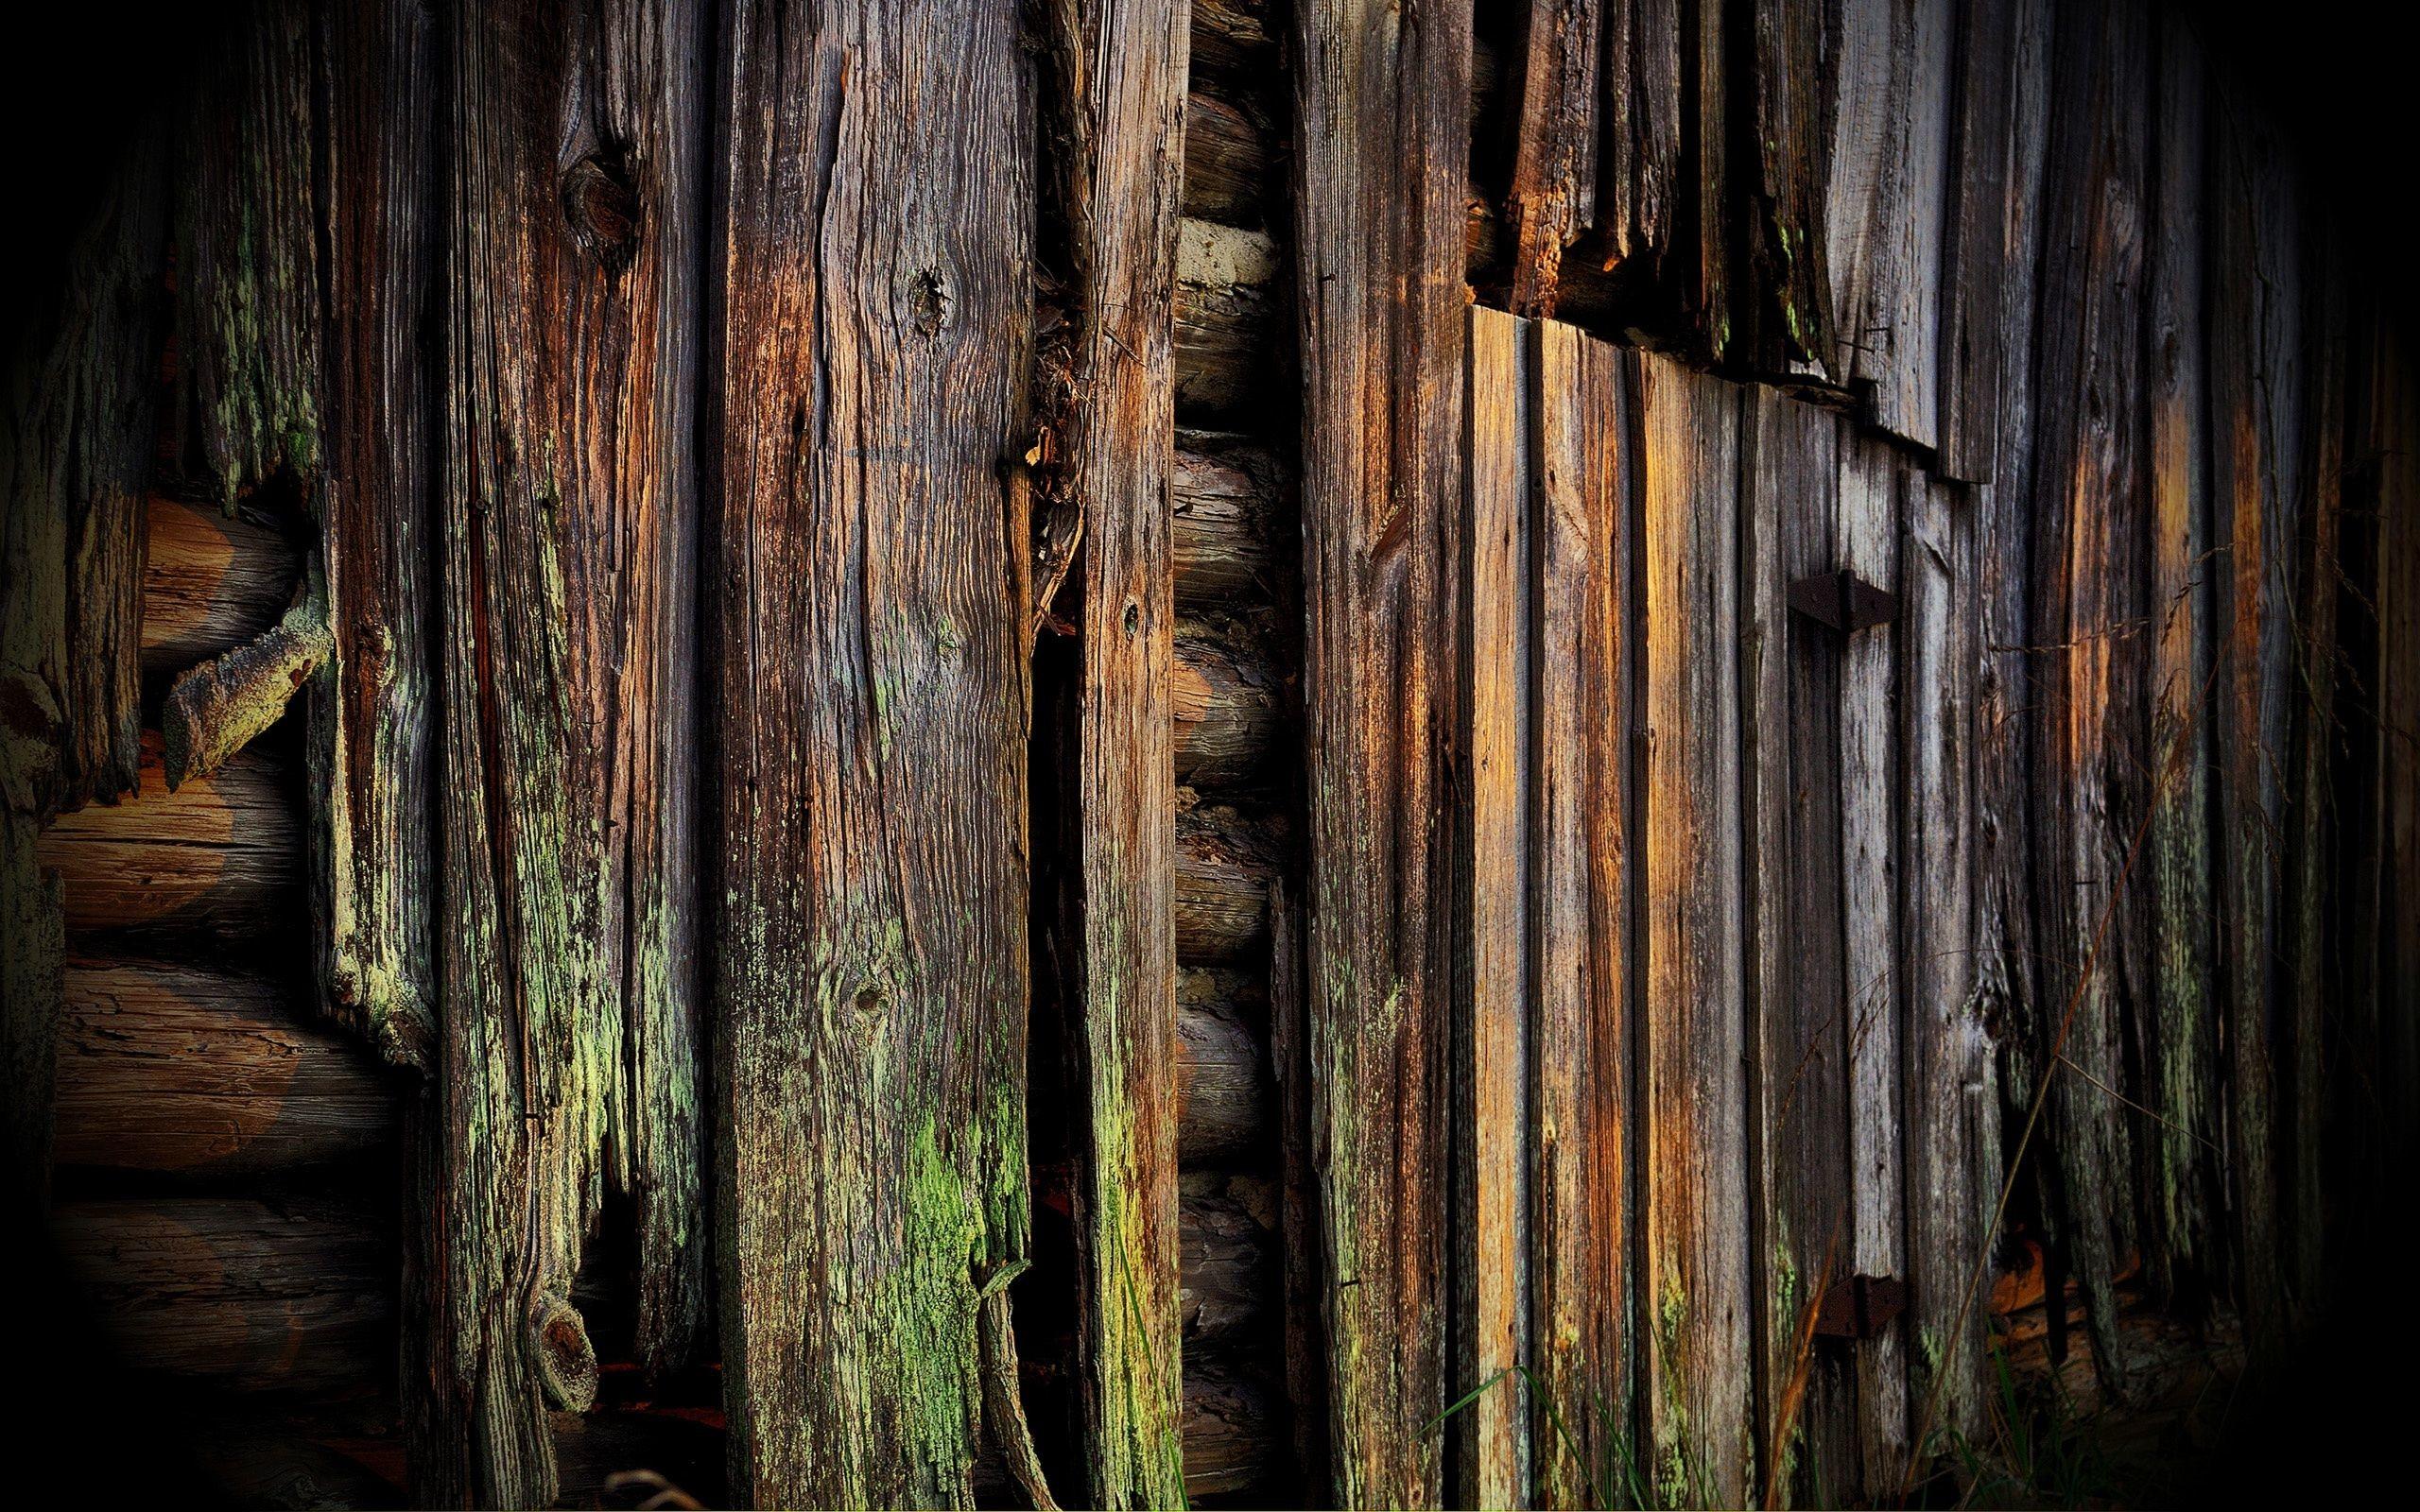 free-desktop-background-download-old-wood-background-and